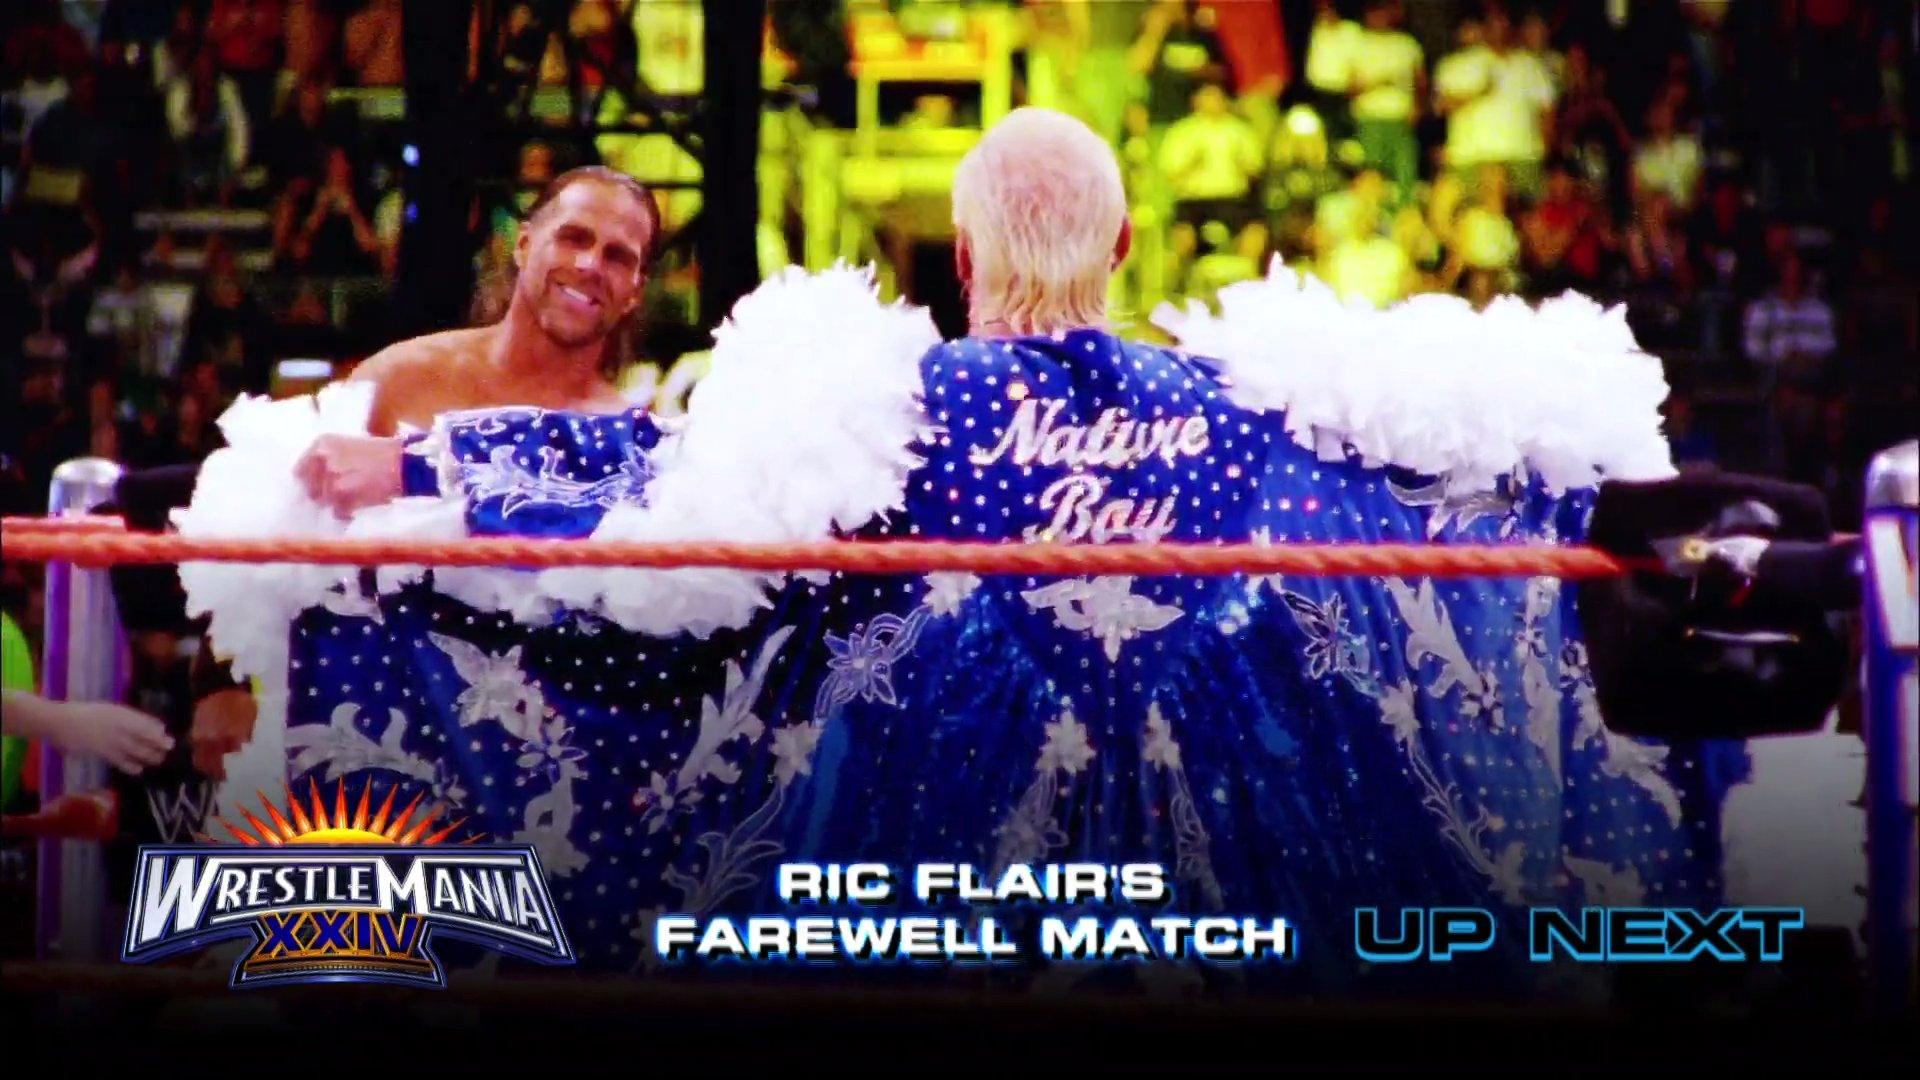 WWE SMACKDOWN (3 de abril 2020)   Resultados en vivo   A un día de WrestleMania 36 10